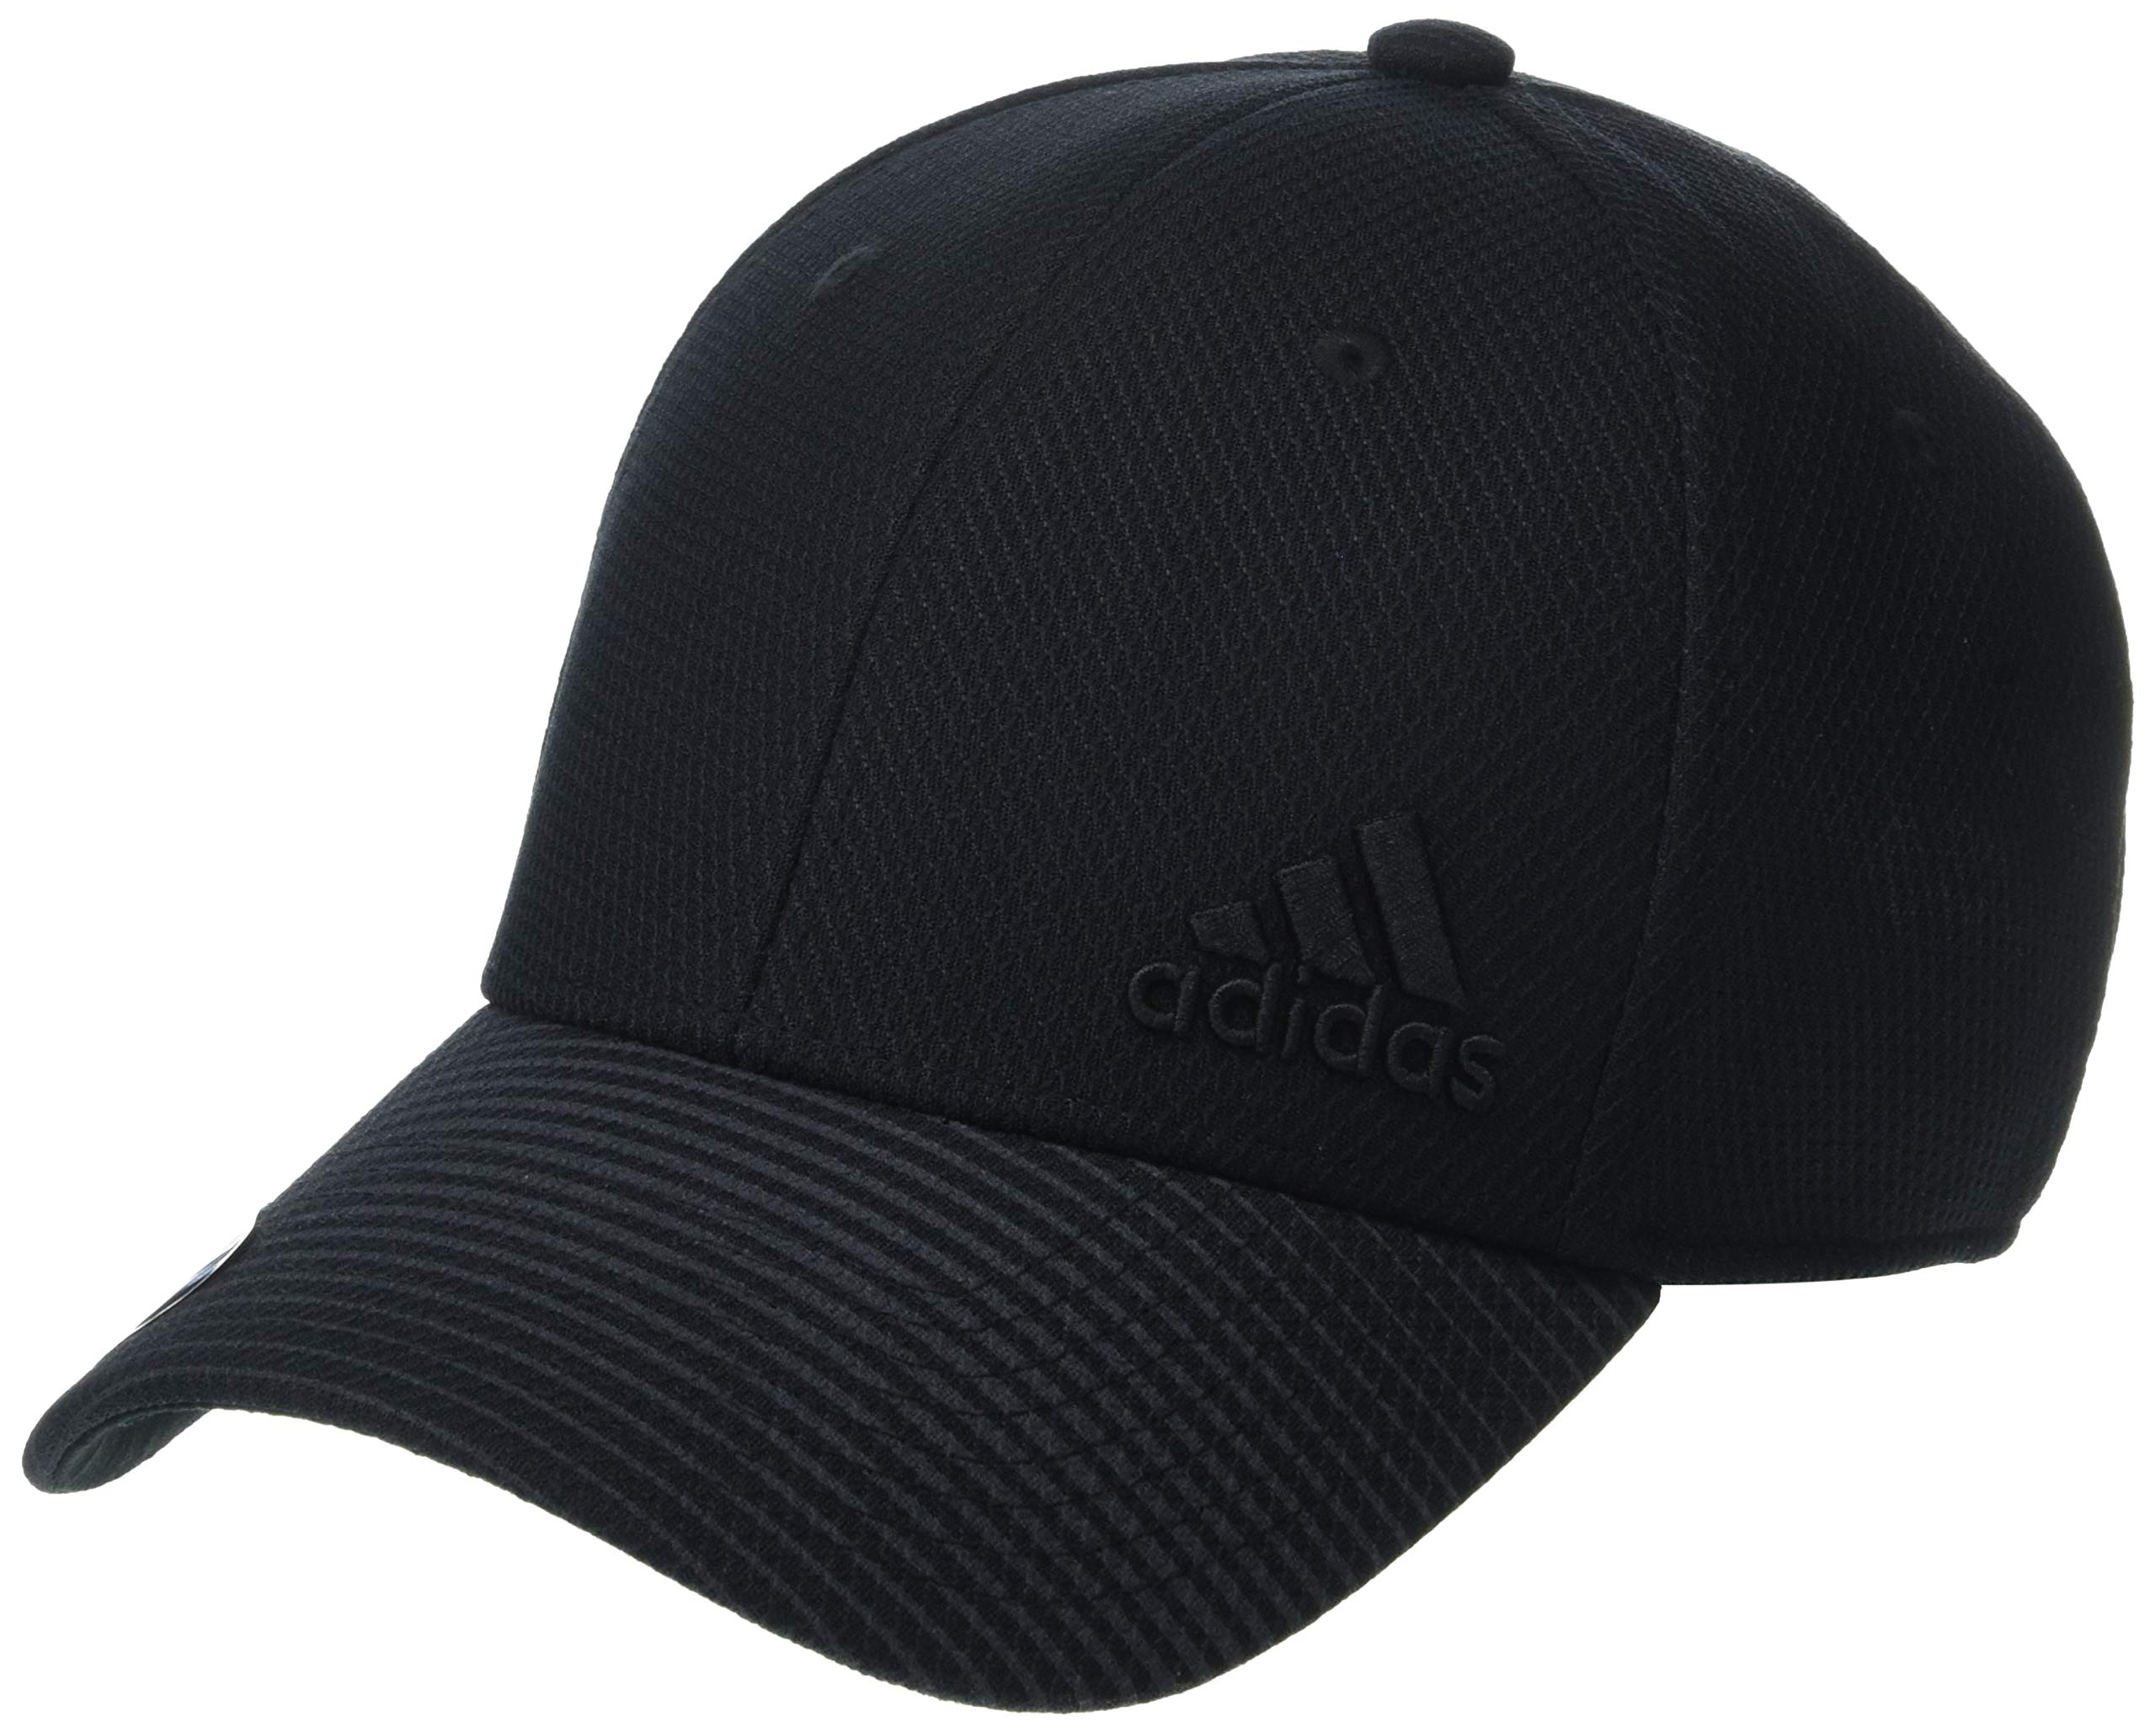 adidas Men's Release Stretch Fit Structured Cap, Black/Black, Large/X-Large